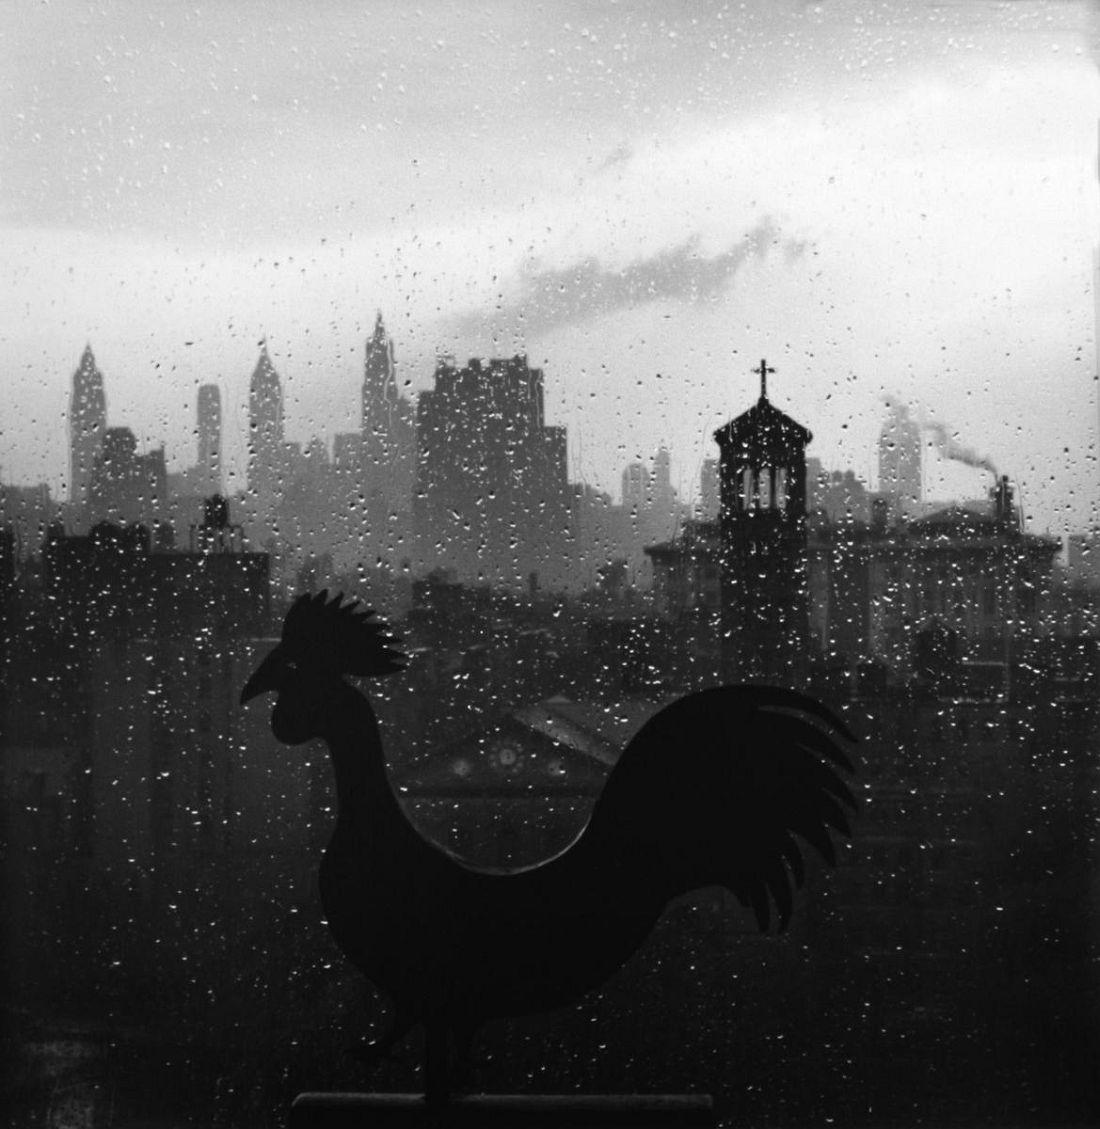 Weather Vane and New York Skyline, September 19, 1952